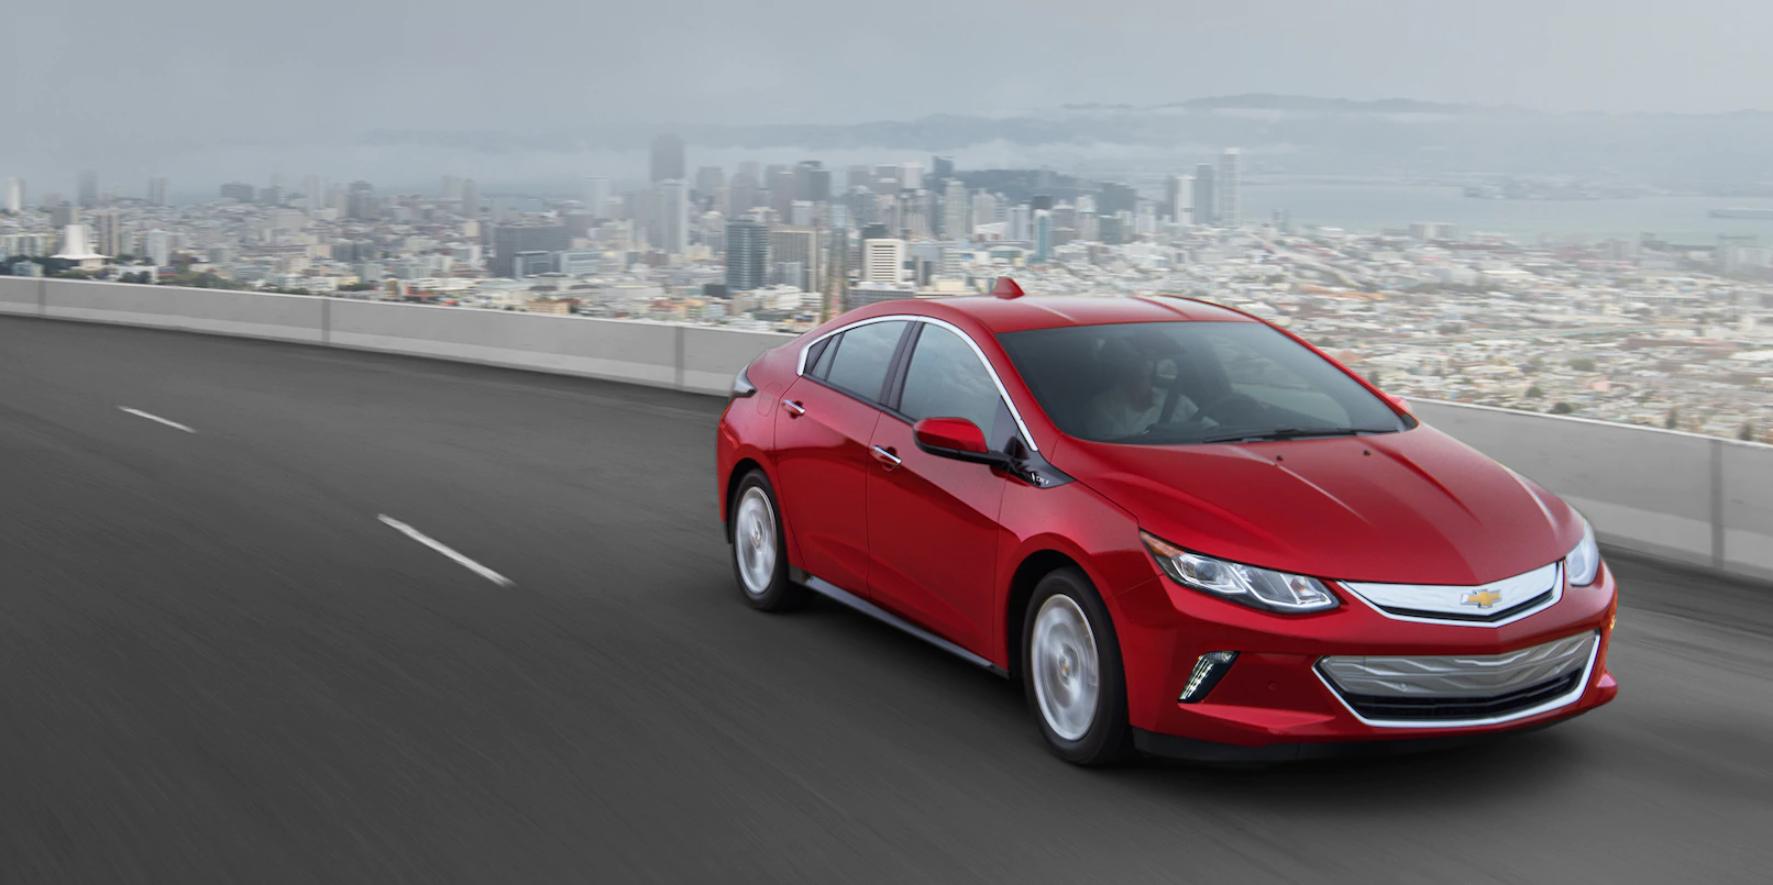 Chevy Volt Vs  Hyundai Ioniq Plug-In: Plug-Ins Battle it Out